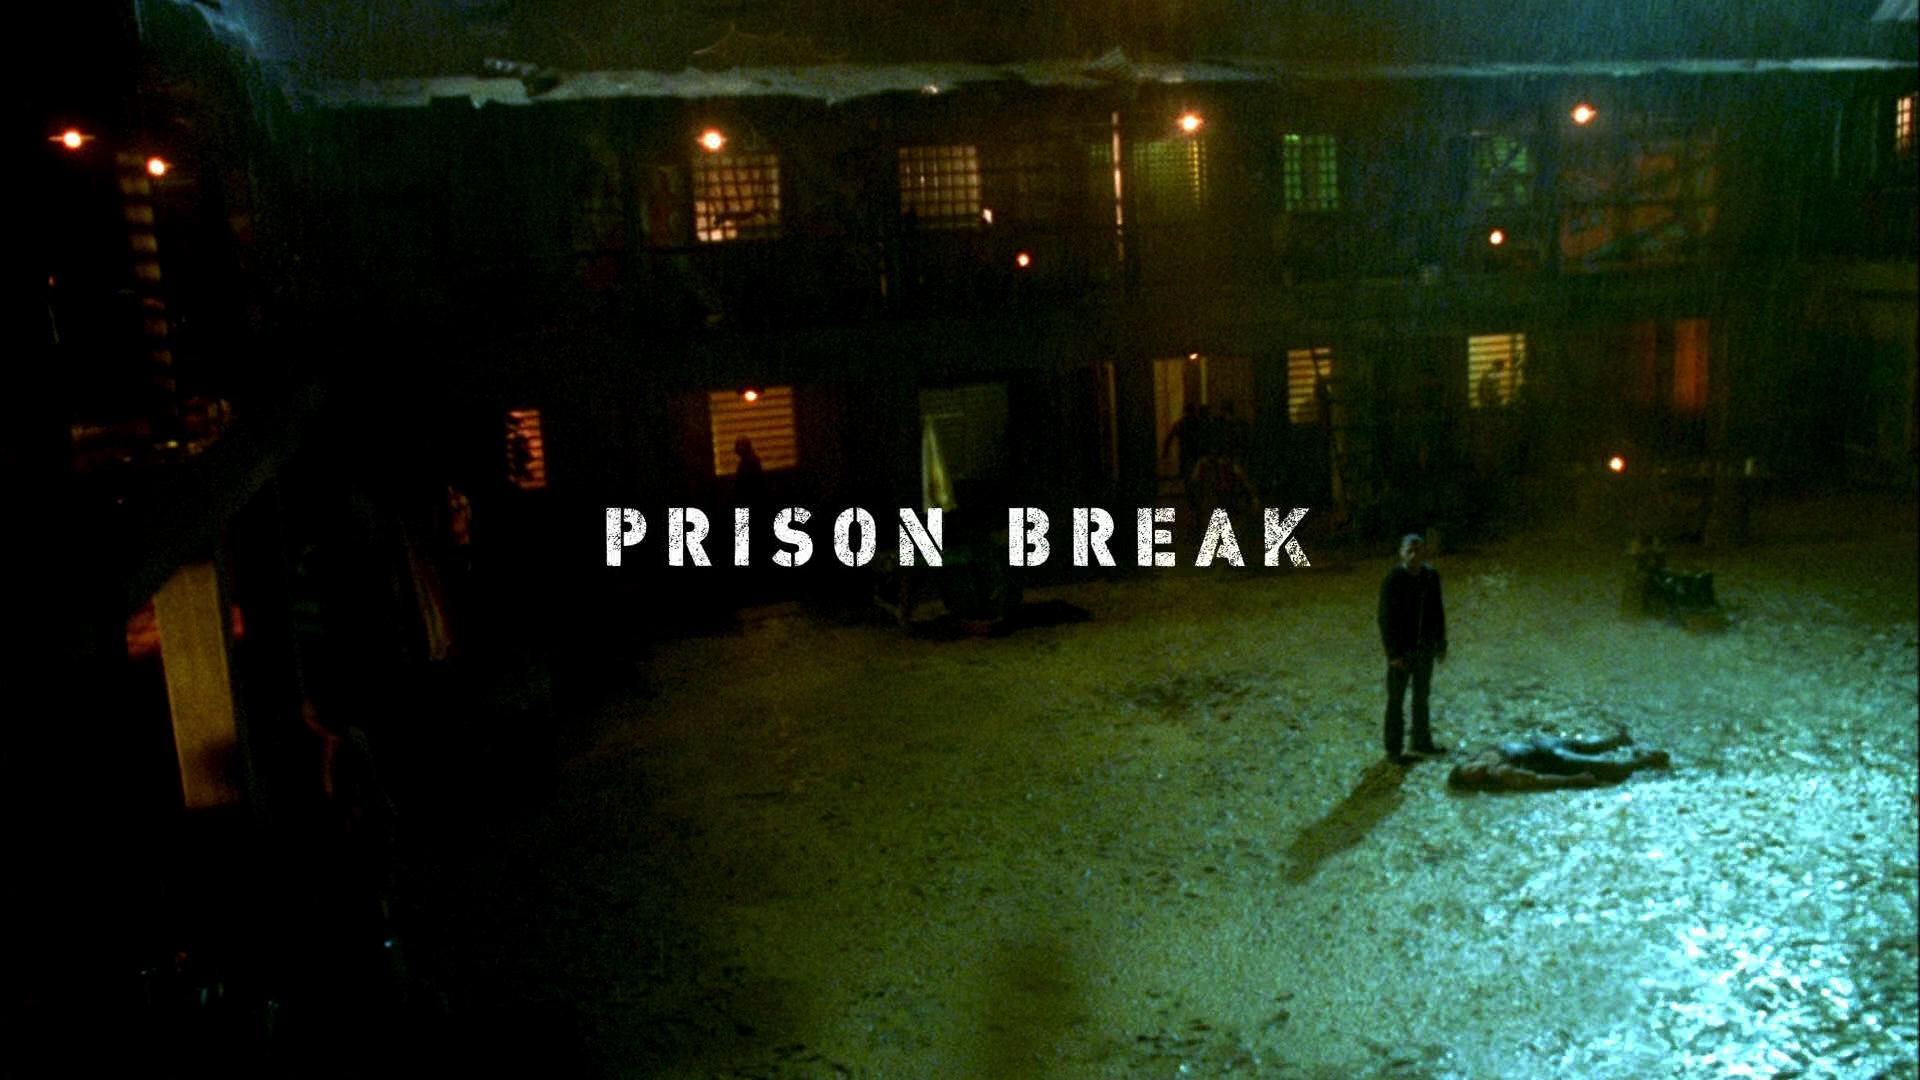 prison break wallpaper 8 | wallpapersbq